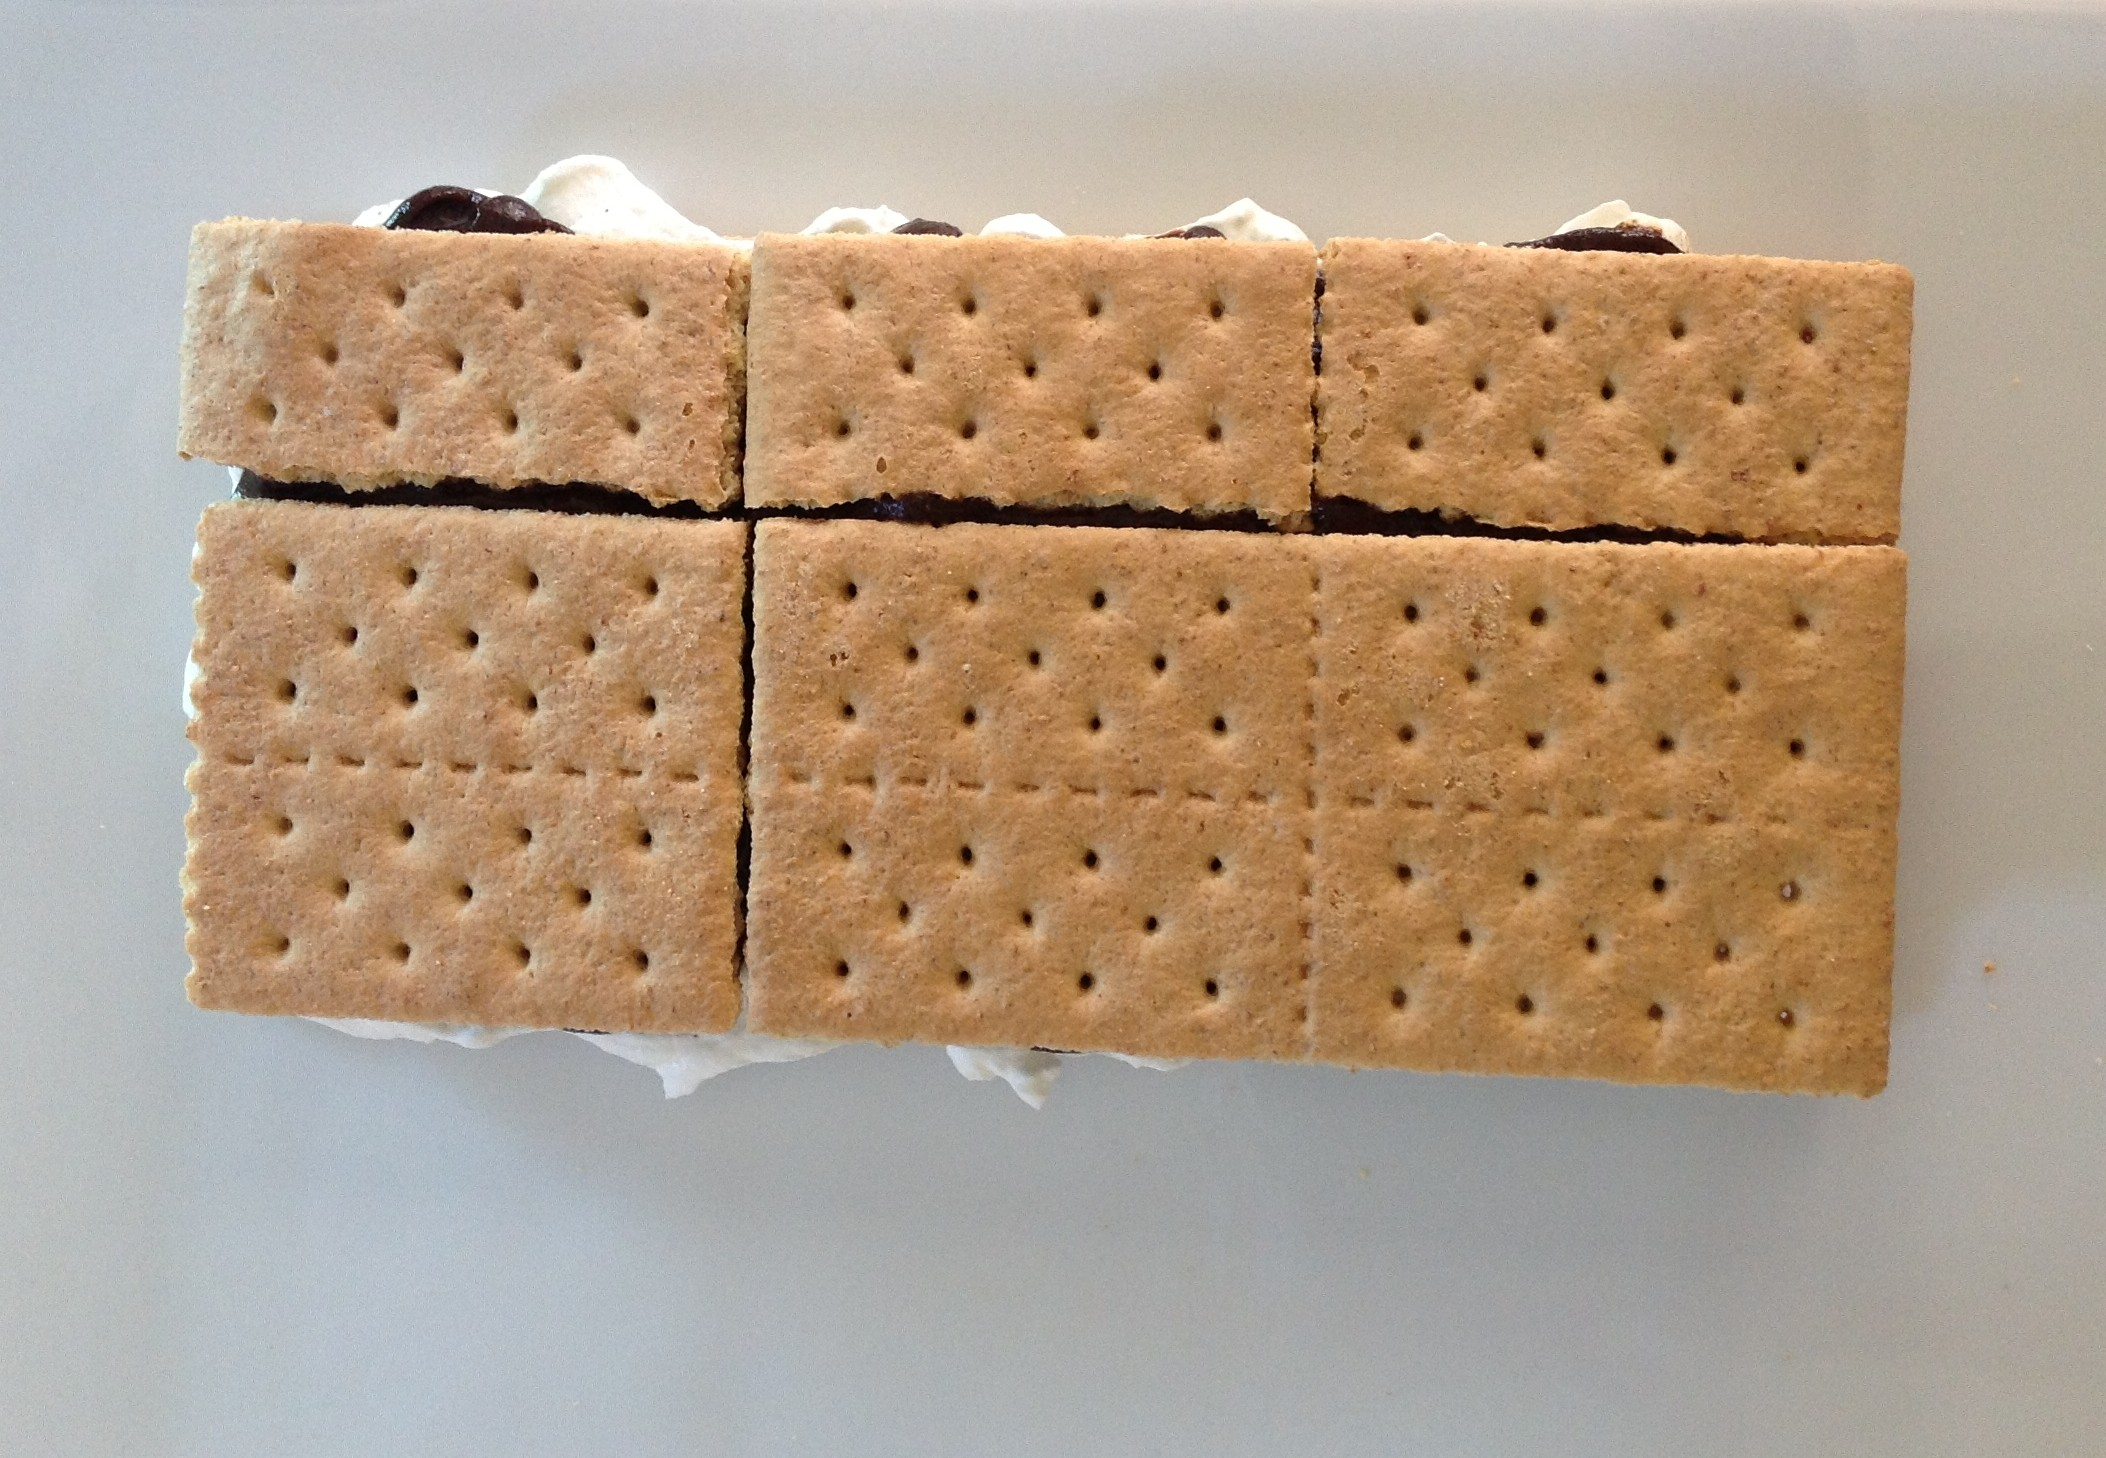 smore cake layer 1